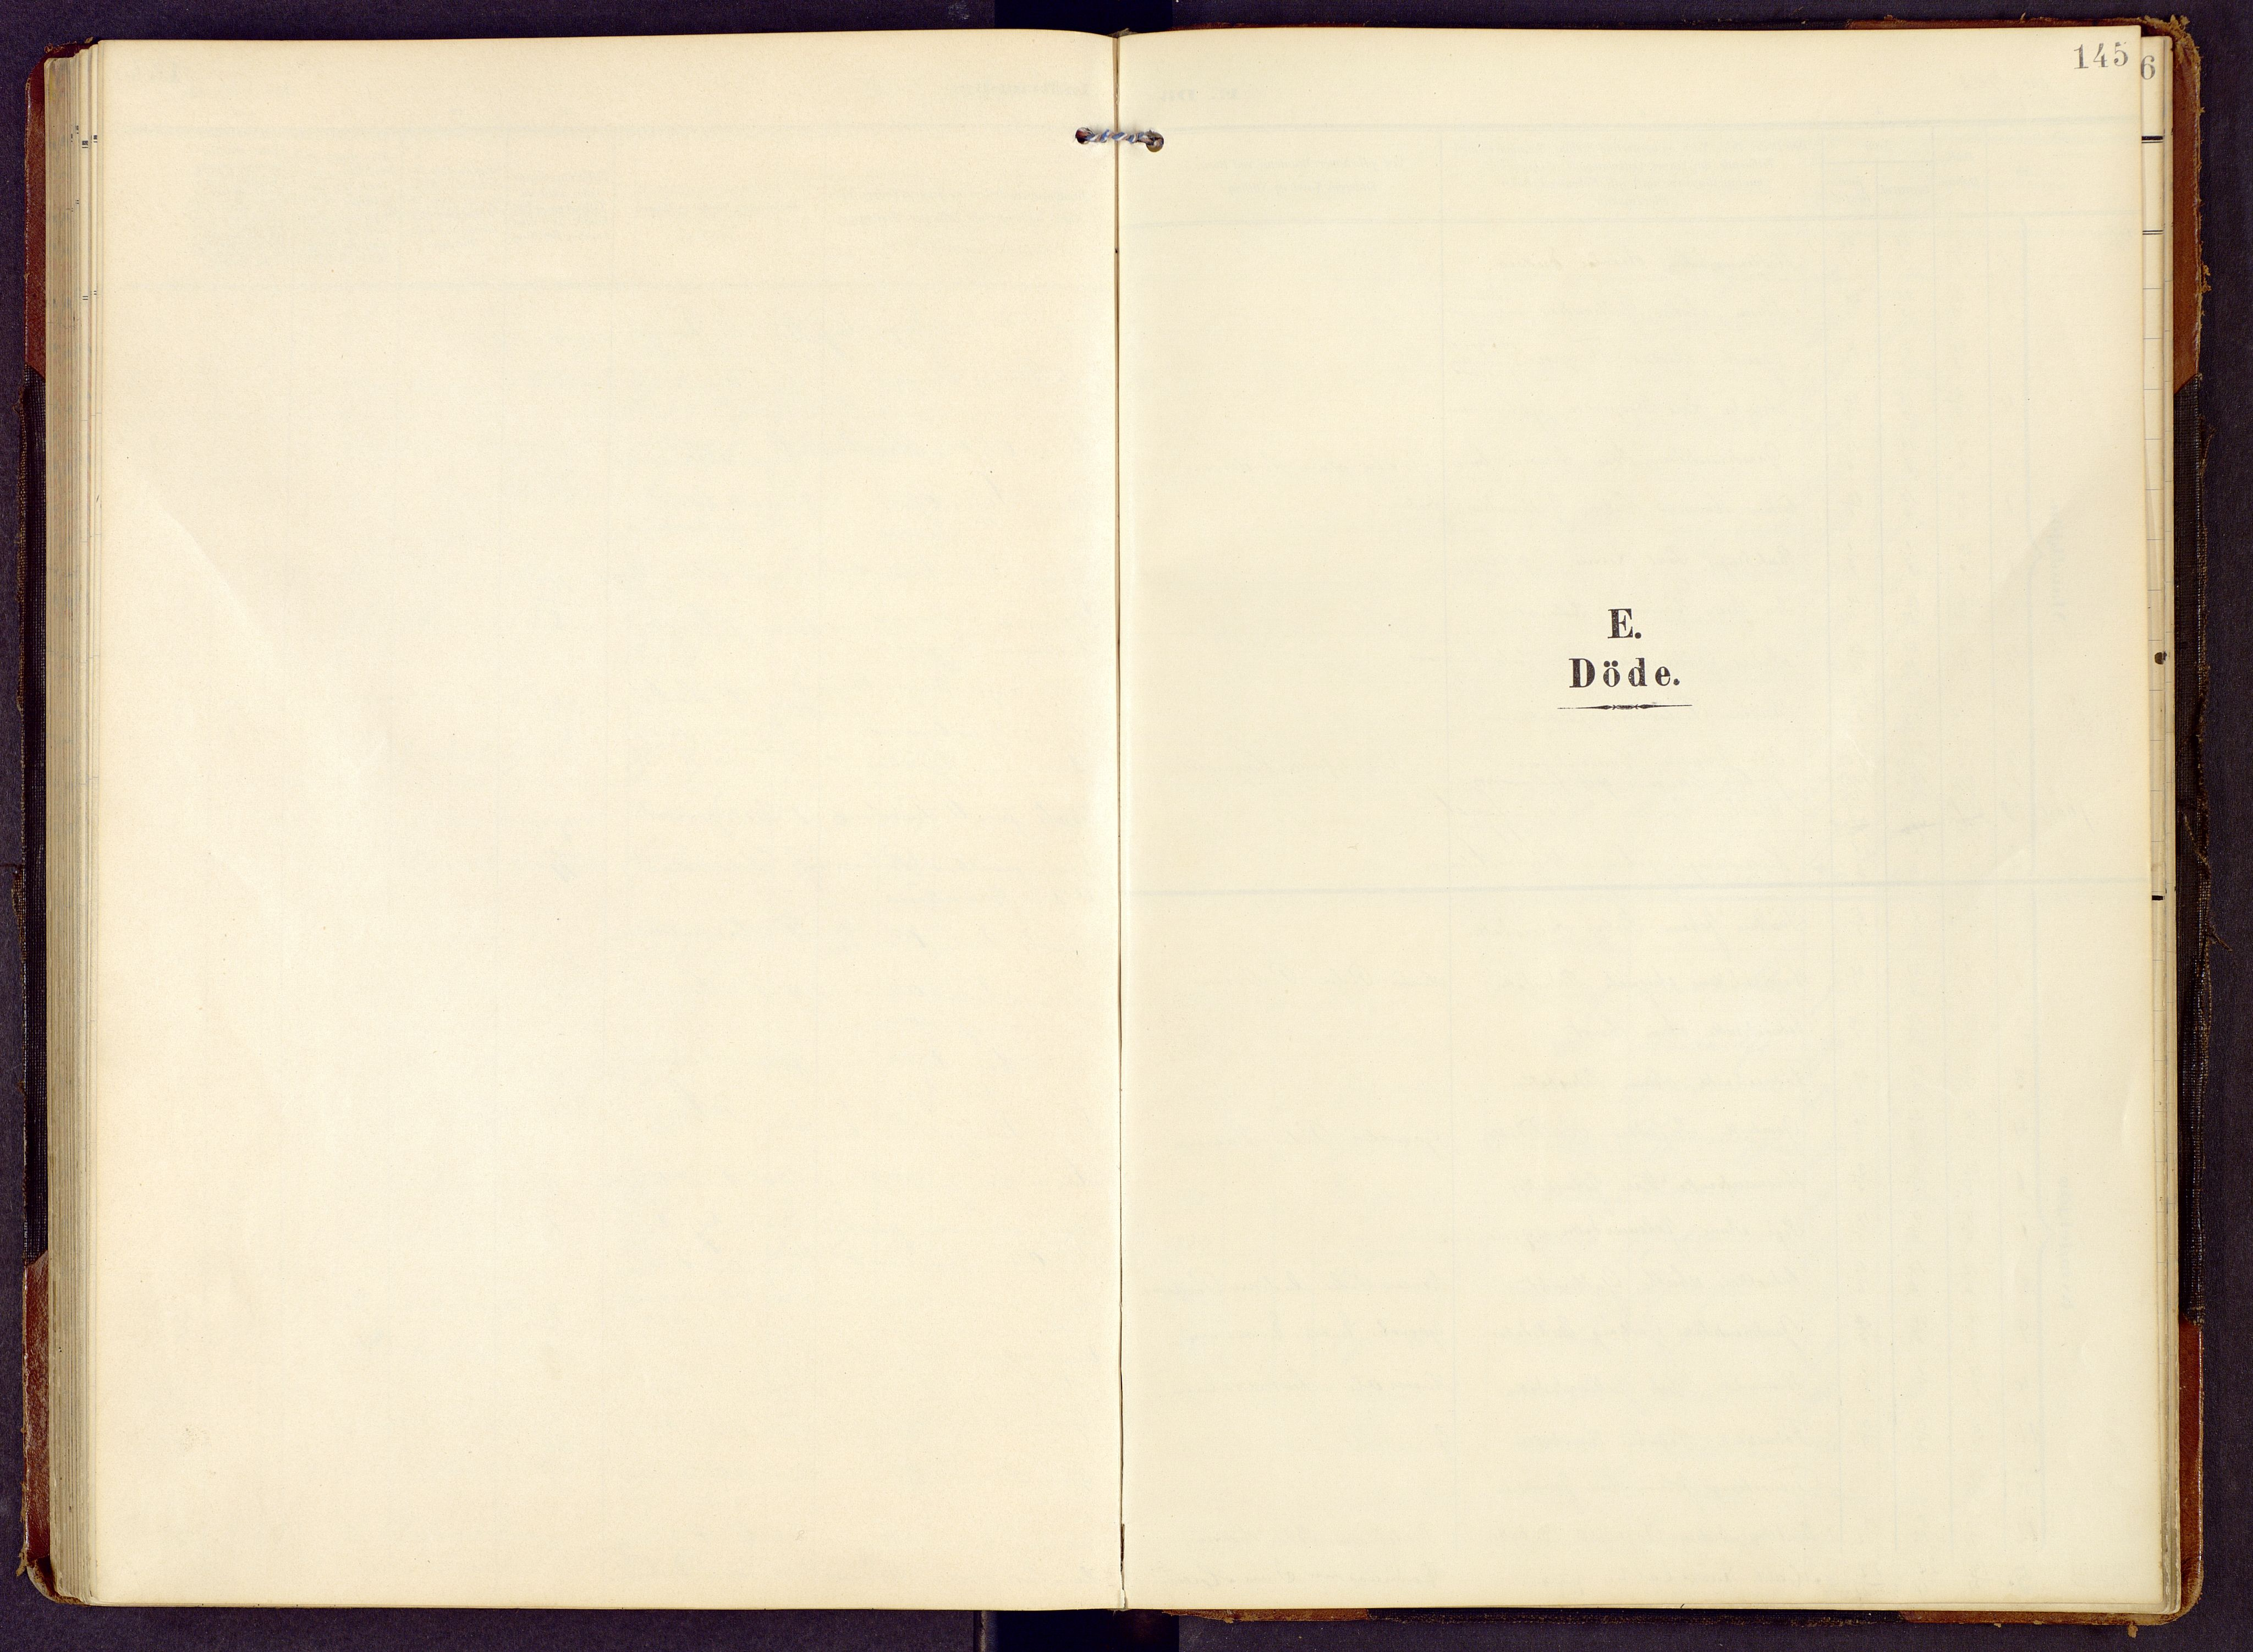 SAH, Brandbu prestekontor, Klokkerbok nr. 9, 1903-1916, s. 145